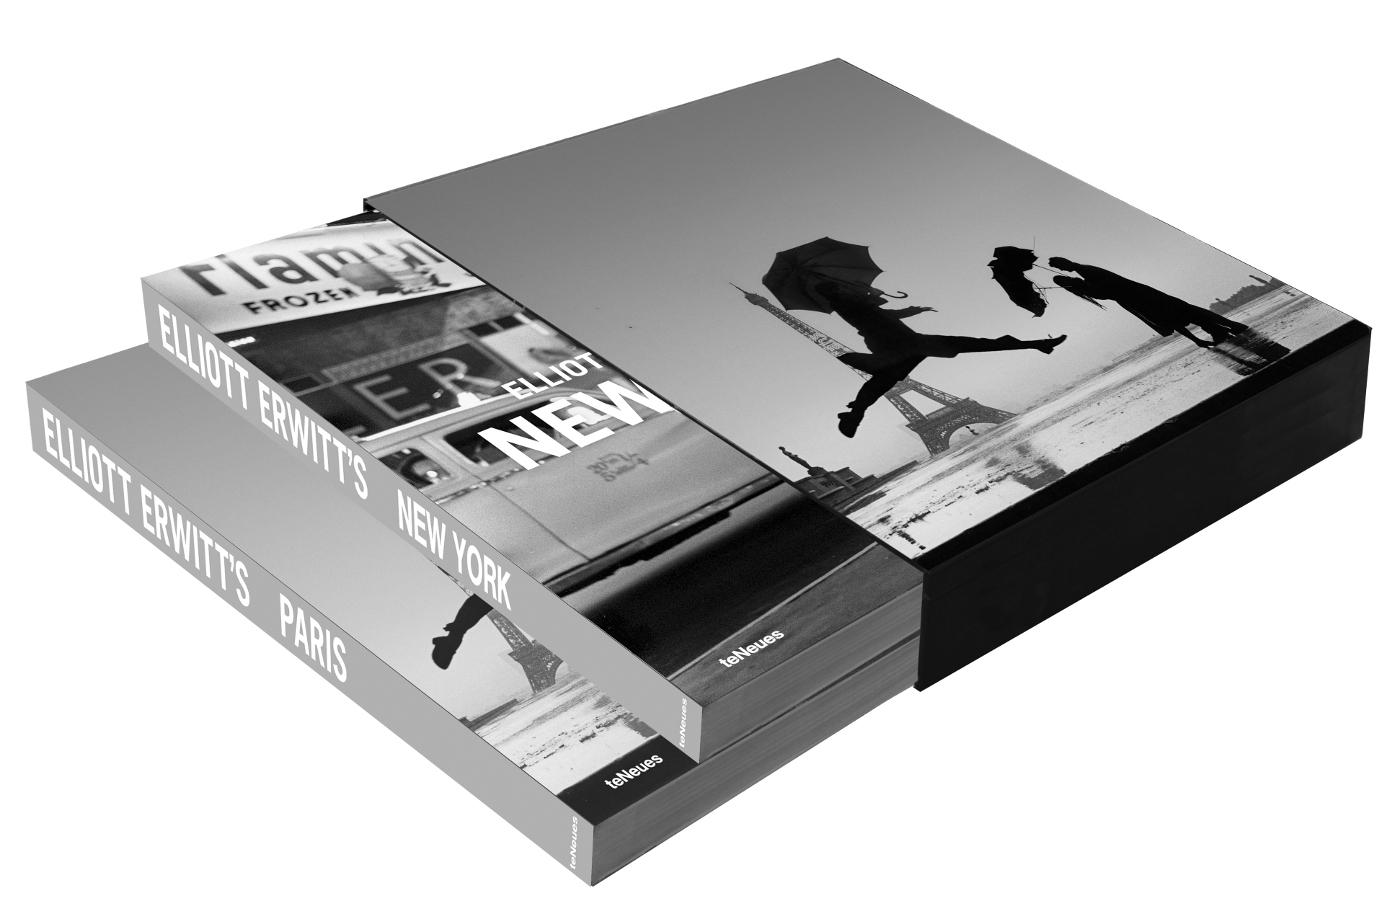 NEW YORK / PARIS BOXSET